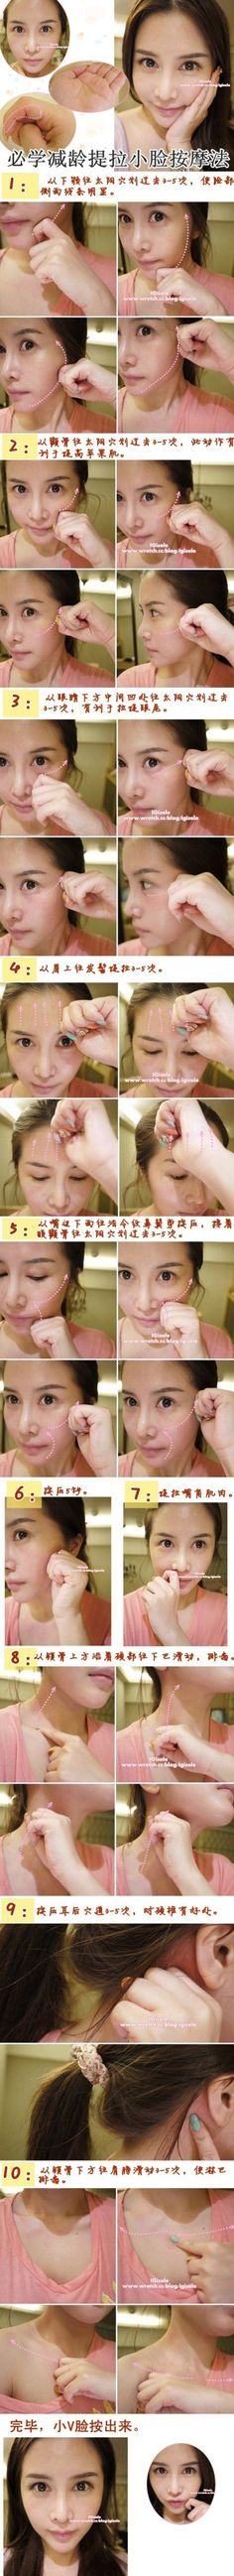 V shape face massage More Beauty & Personal Care - skin care face - http://amzn.to/2kVpuh4